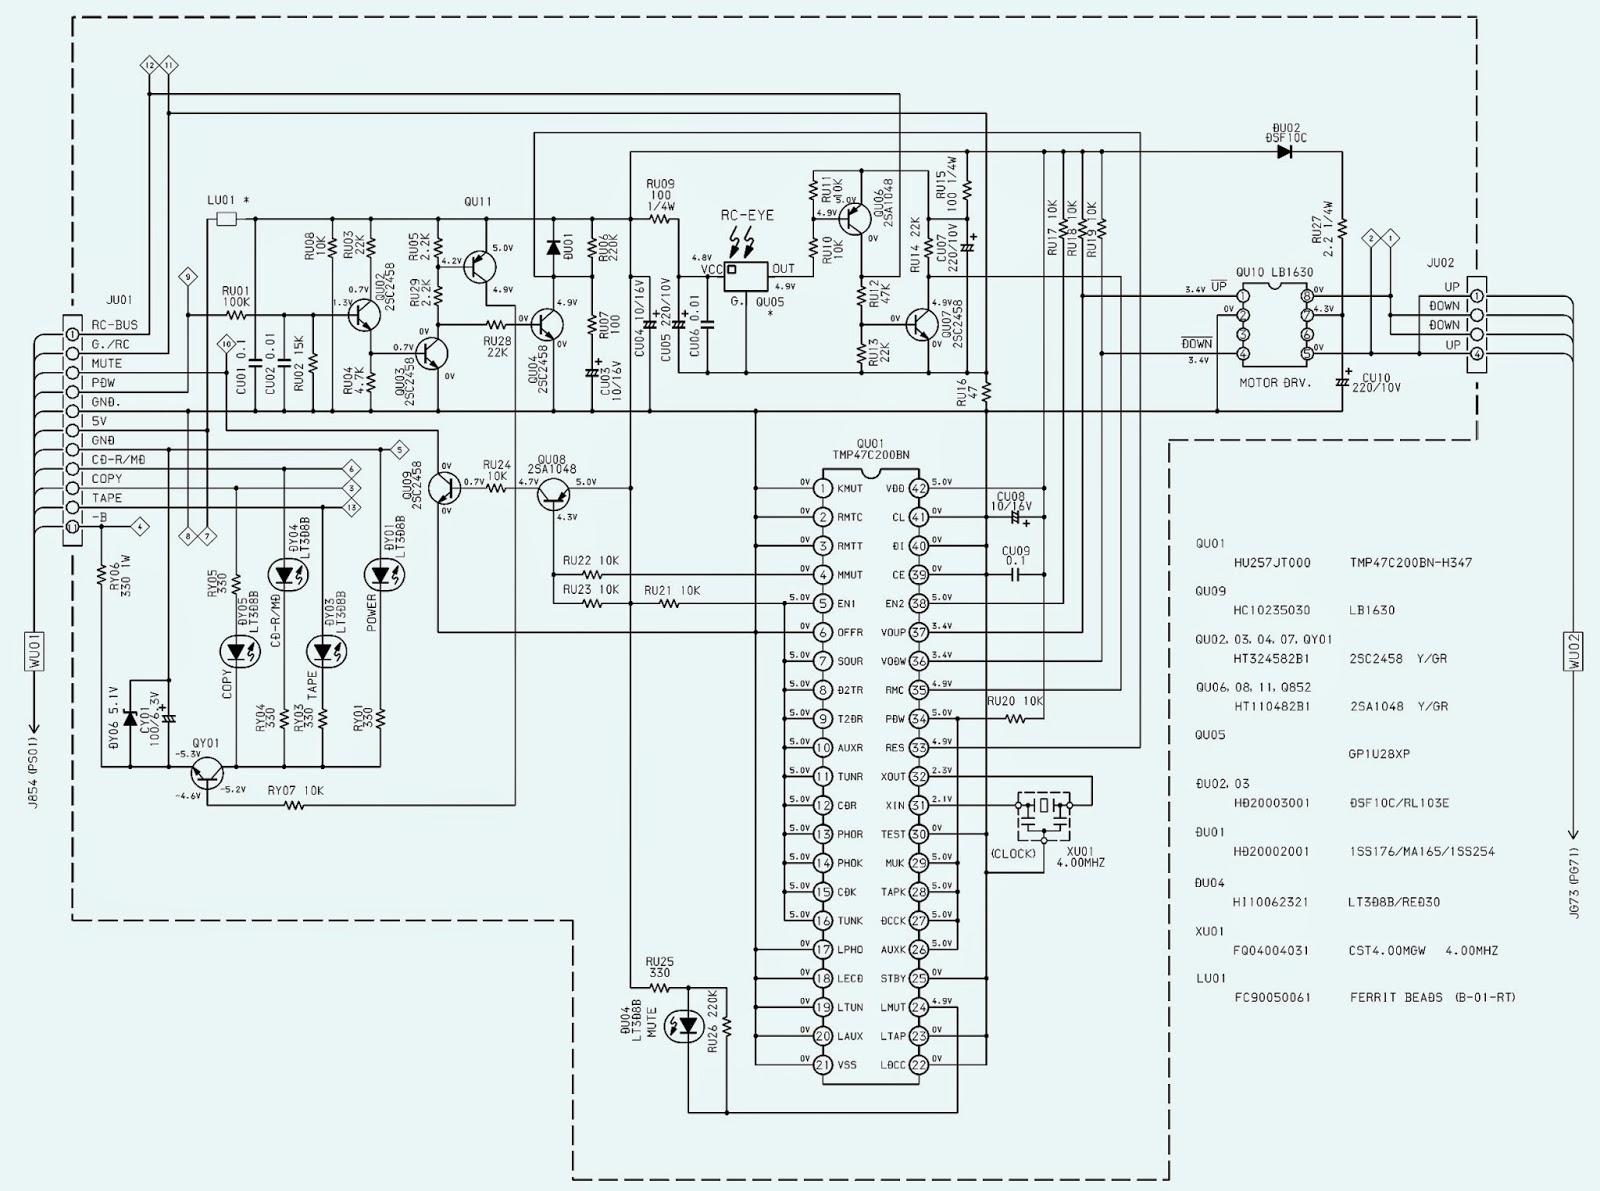 2015 Camry Wiring Diagram Wiring Amp Diagram Info Marantz Pm6010 Ose Schematic Wiring